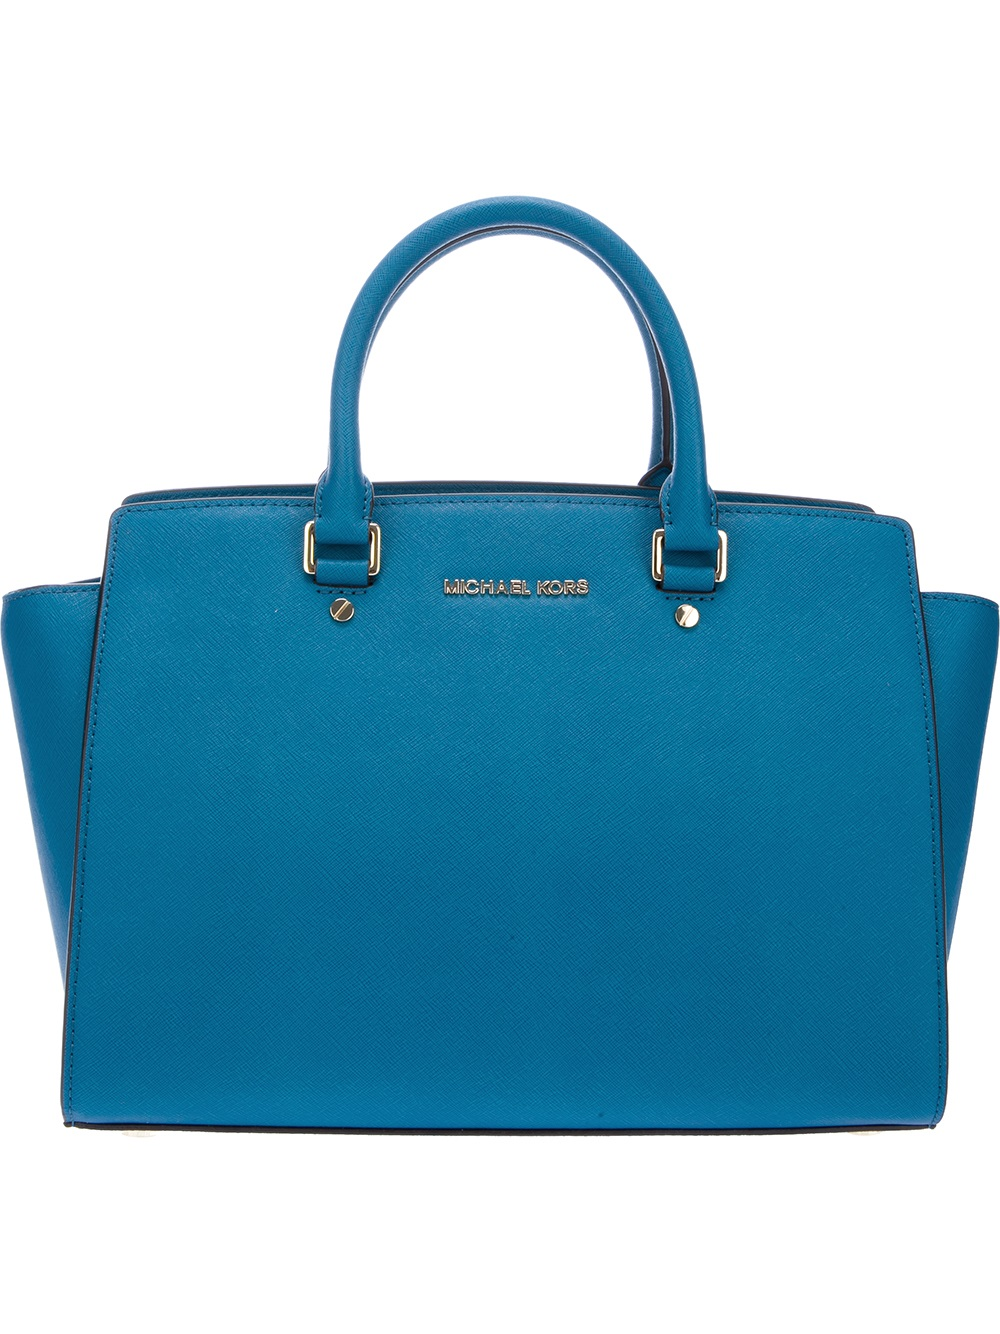 michael michael kors selma handbag in blue turquoise lyst